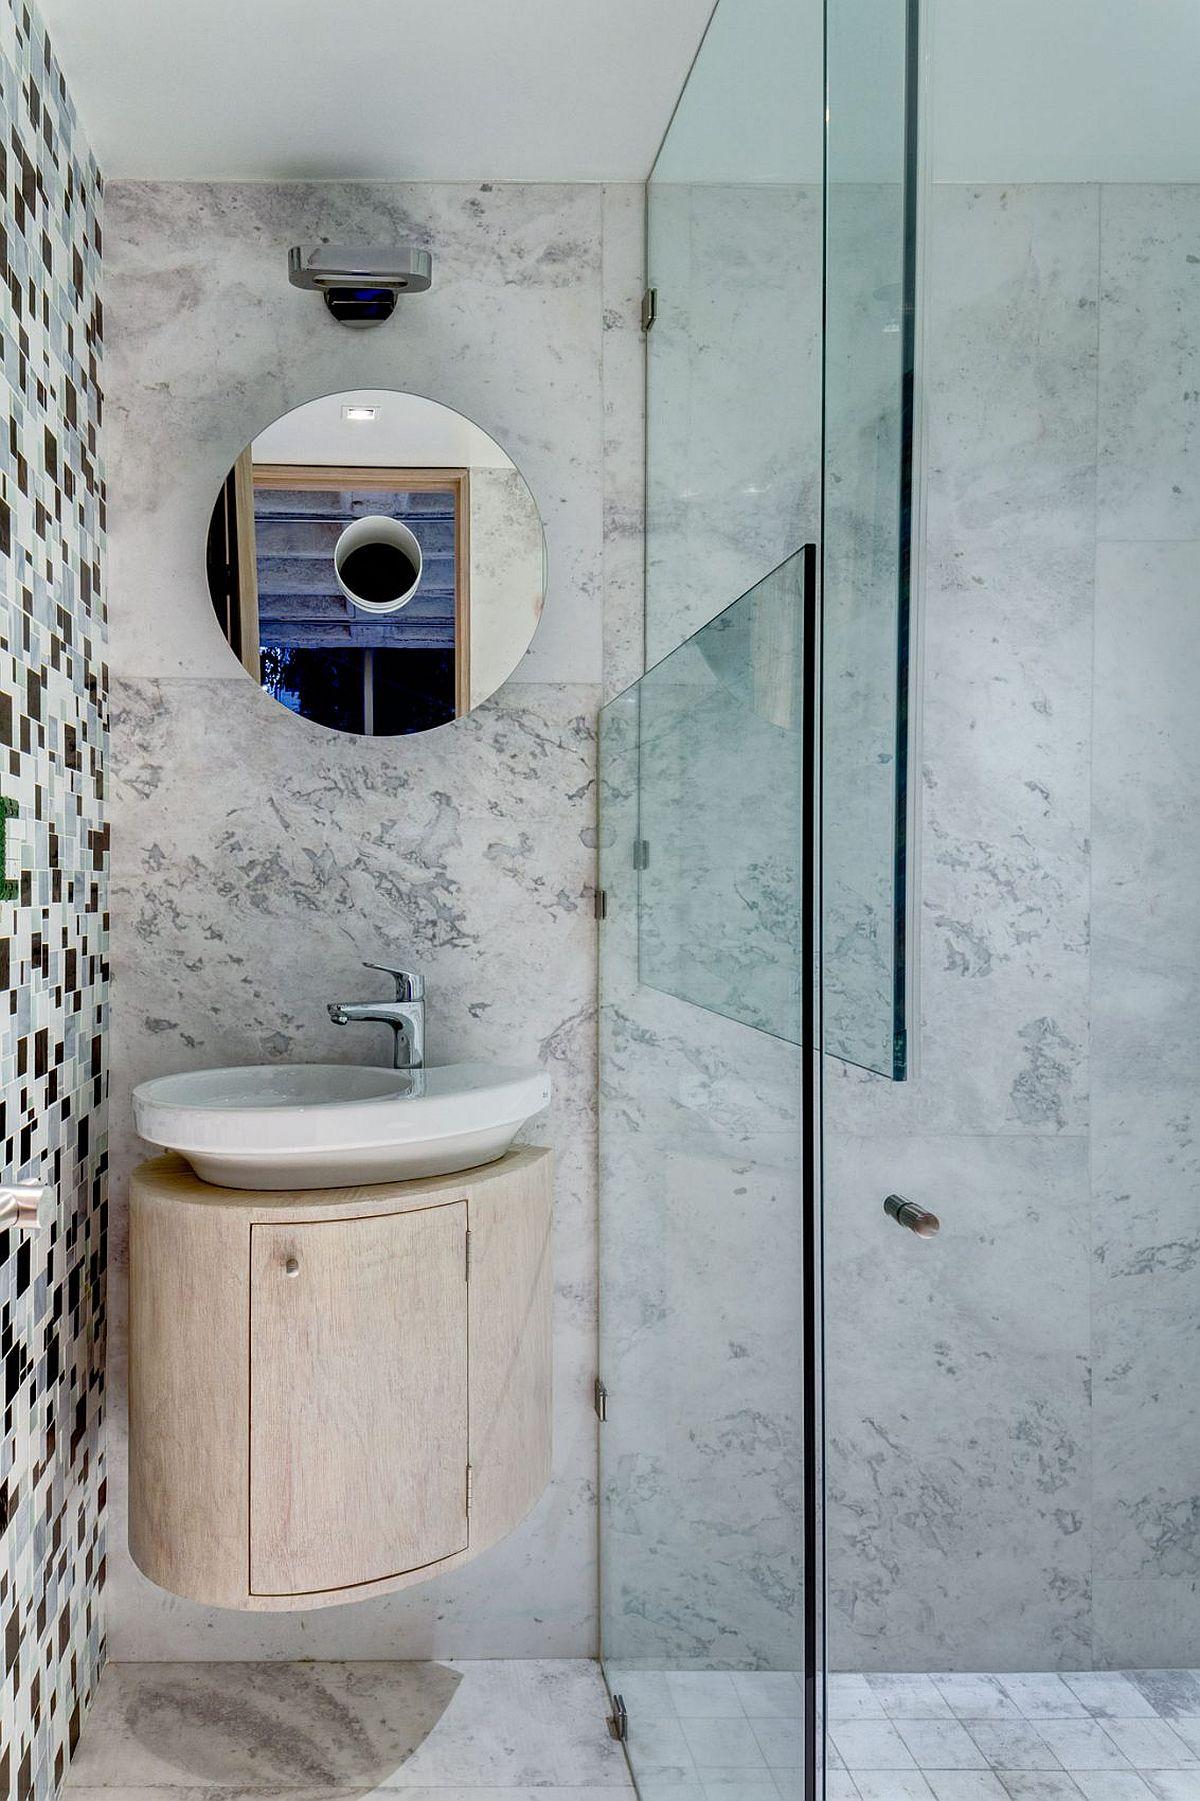 Small bathroom sink and vanity idea